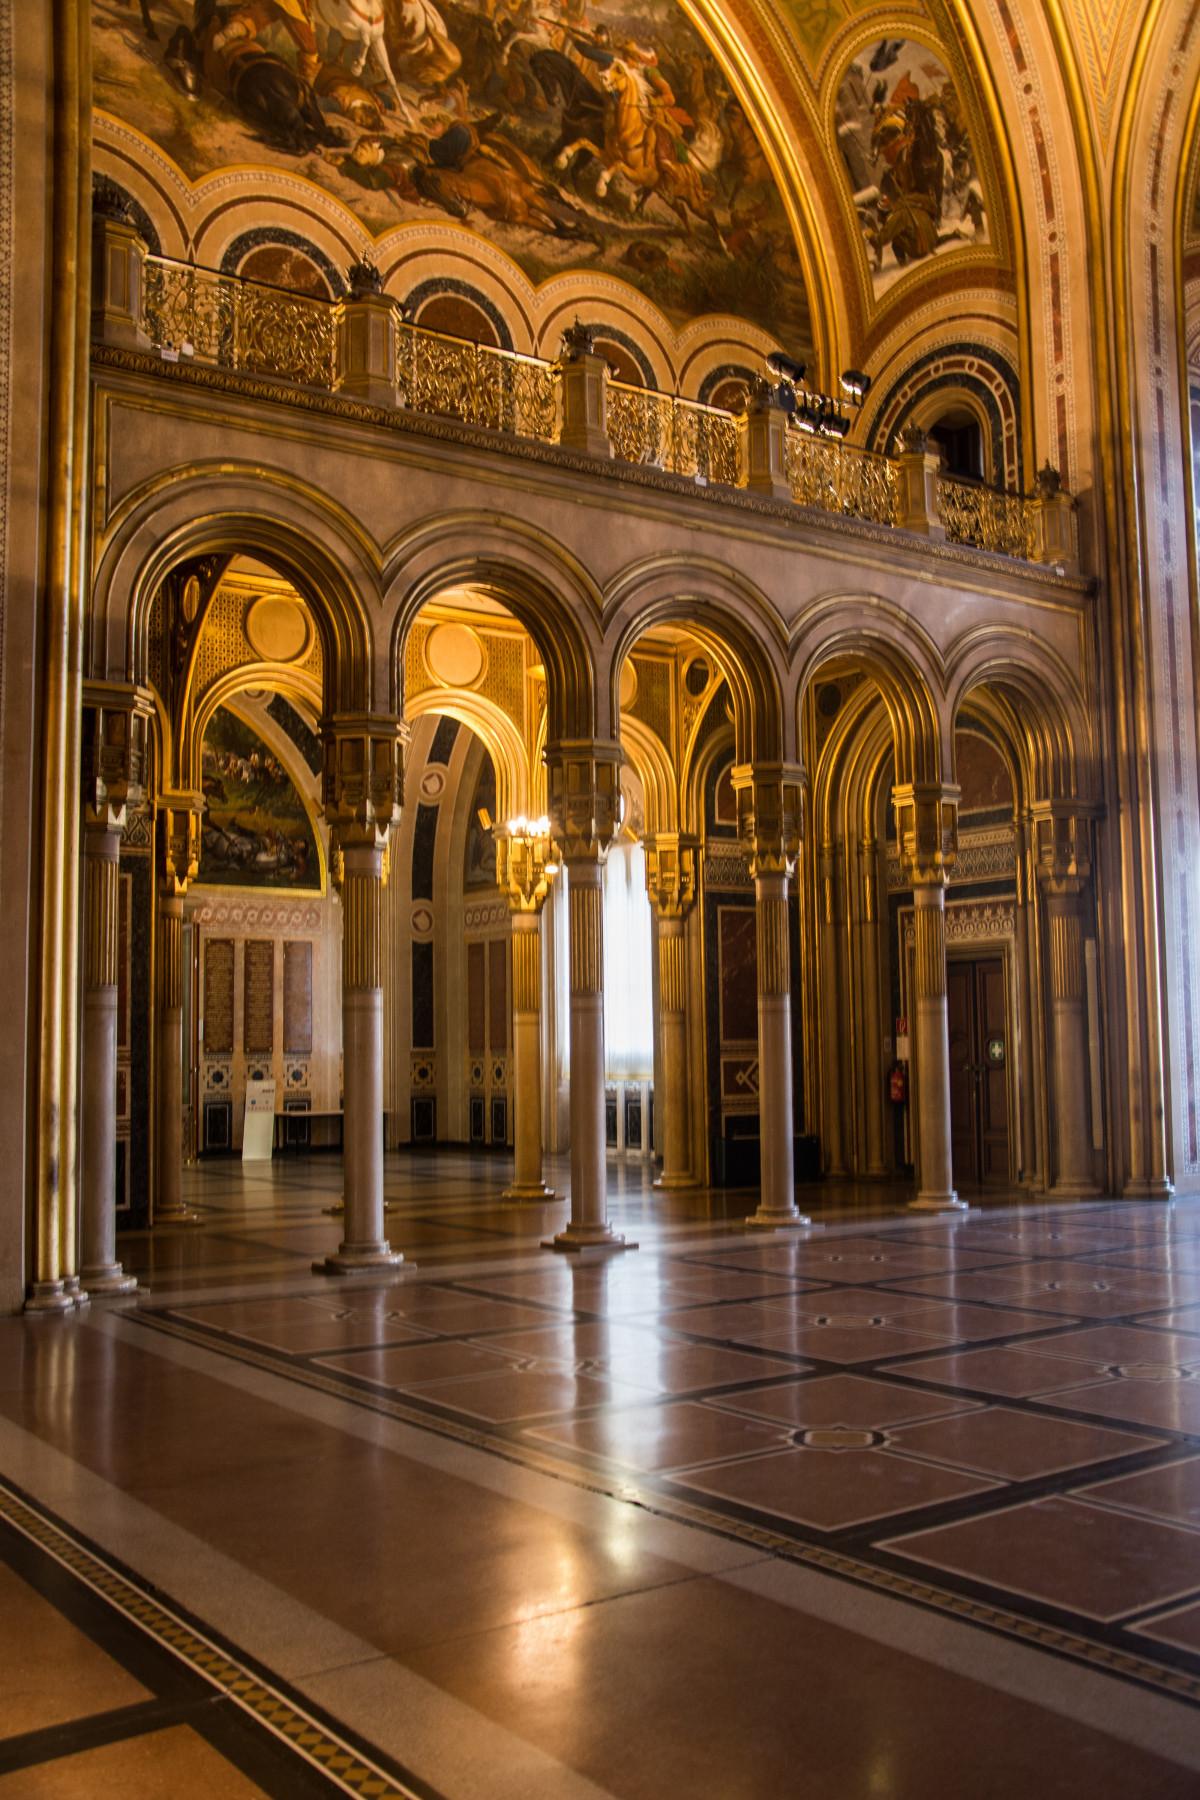 Fotos gratis arquitectura edificio palacio arco for Sala 0 palacio de la prensa